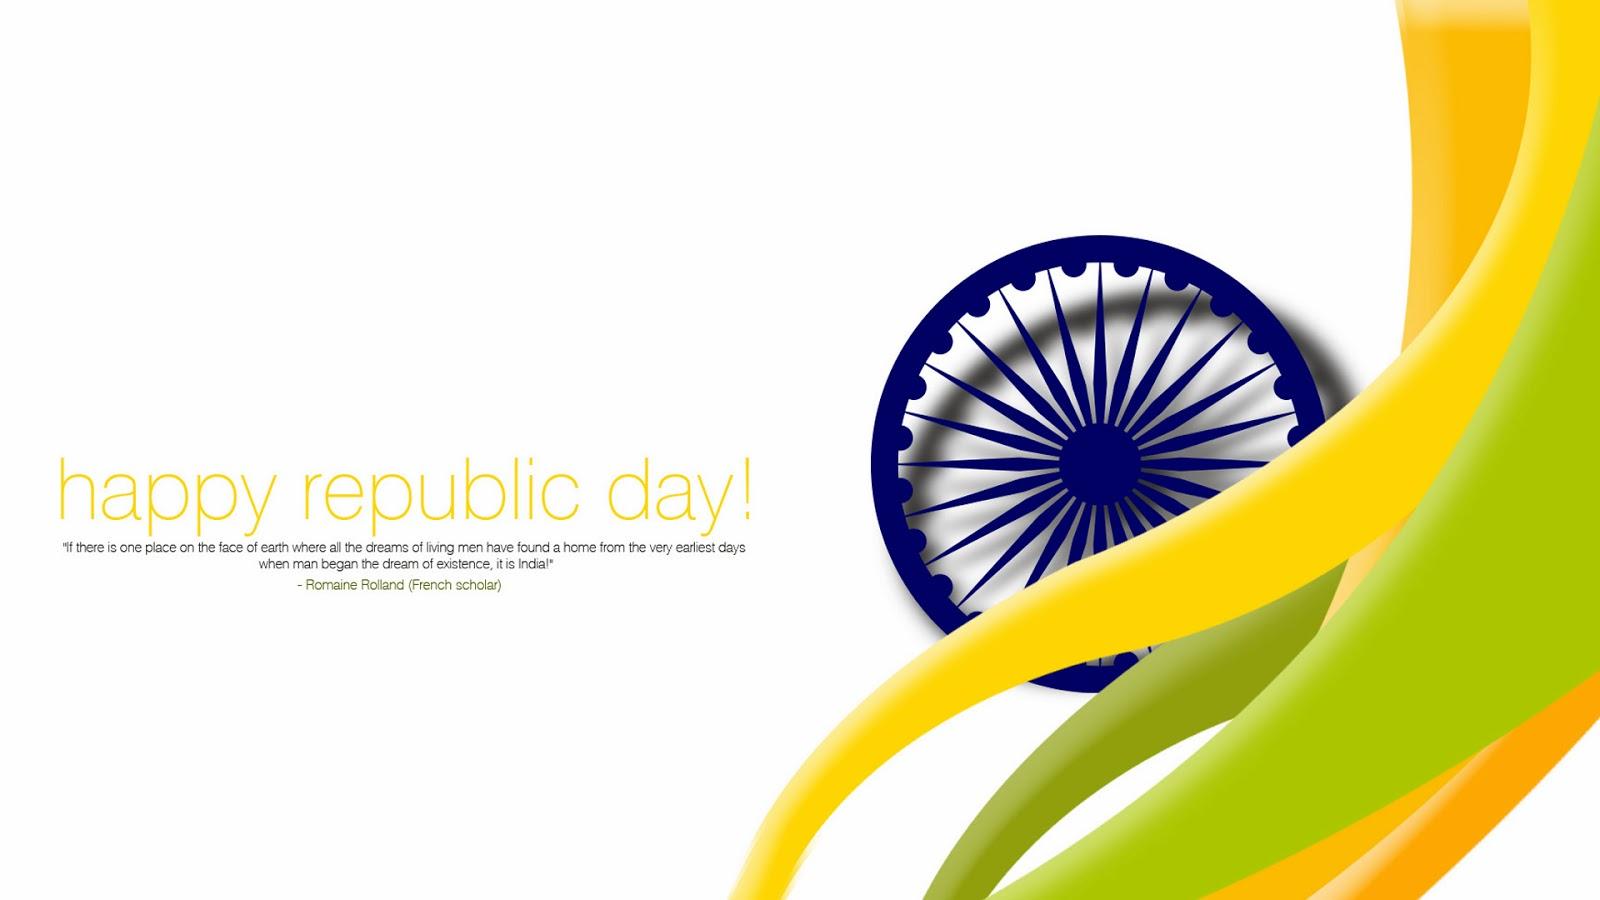 Happy Republic Day 2015